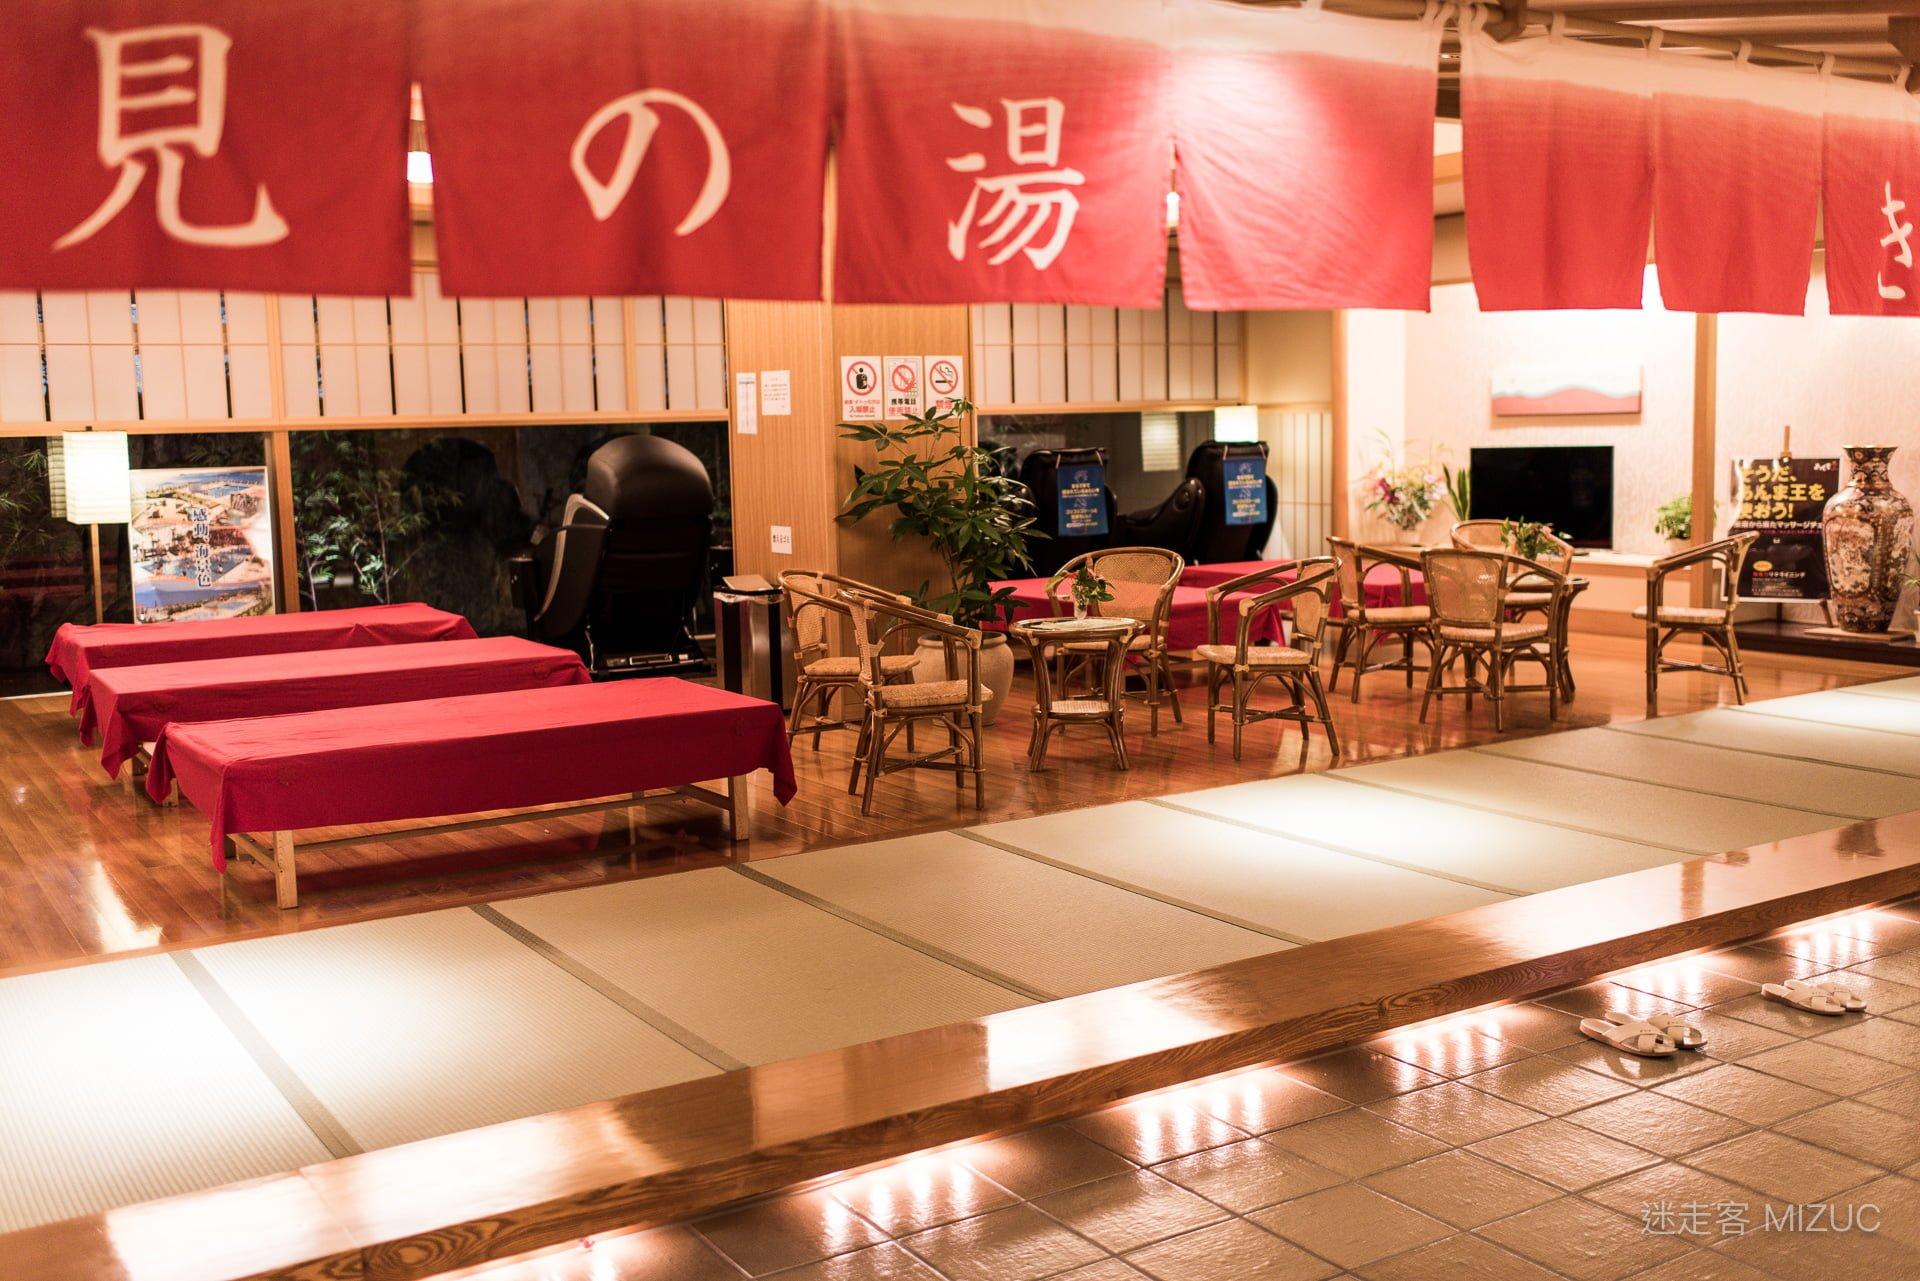 201711 Ibaraki Tochigi Gunma Japan Travel By RentalCar 49 日本自駕旅遊/北關東三縣「茨城、櫪木、群馬」秋天美食、溫泉與瀑布秘境百景(精選照片分享)